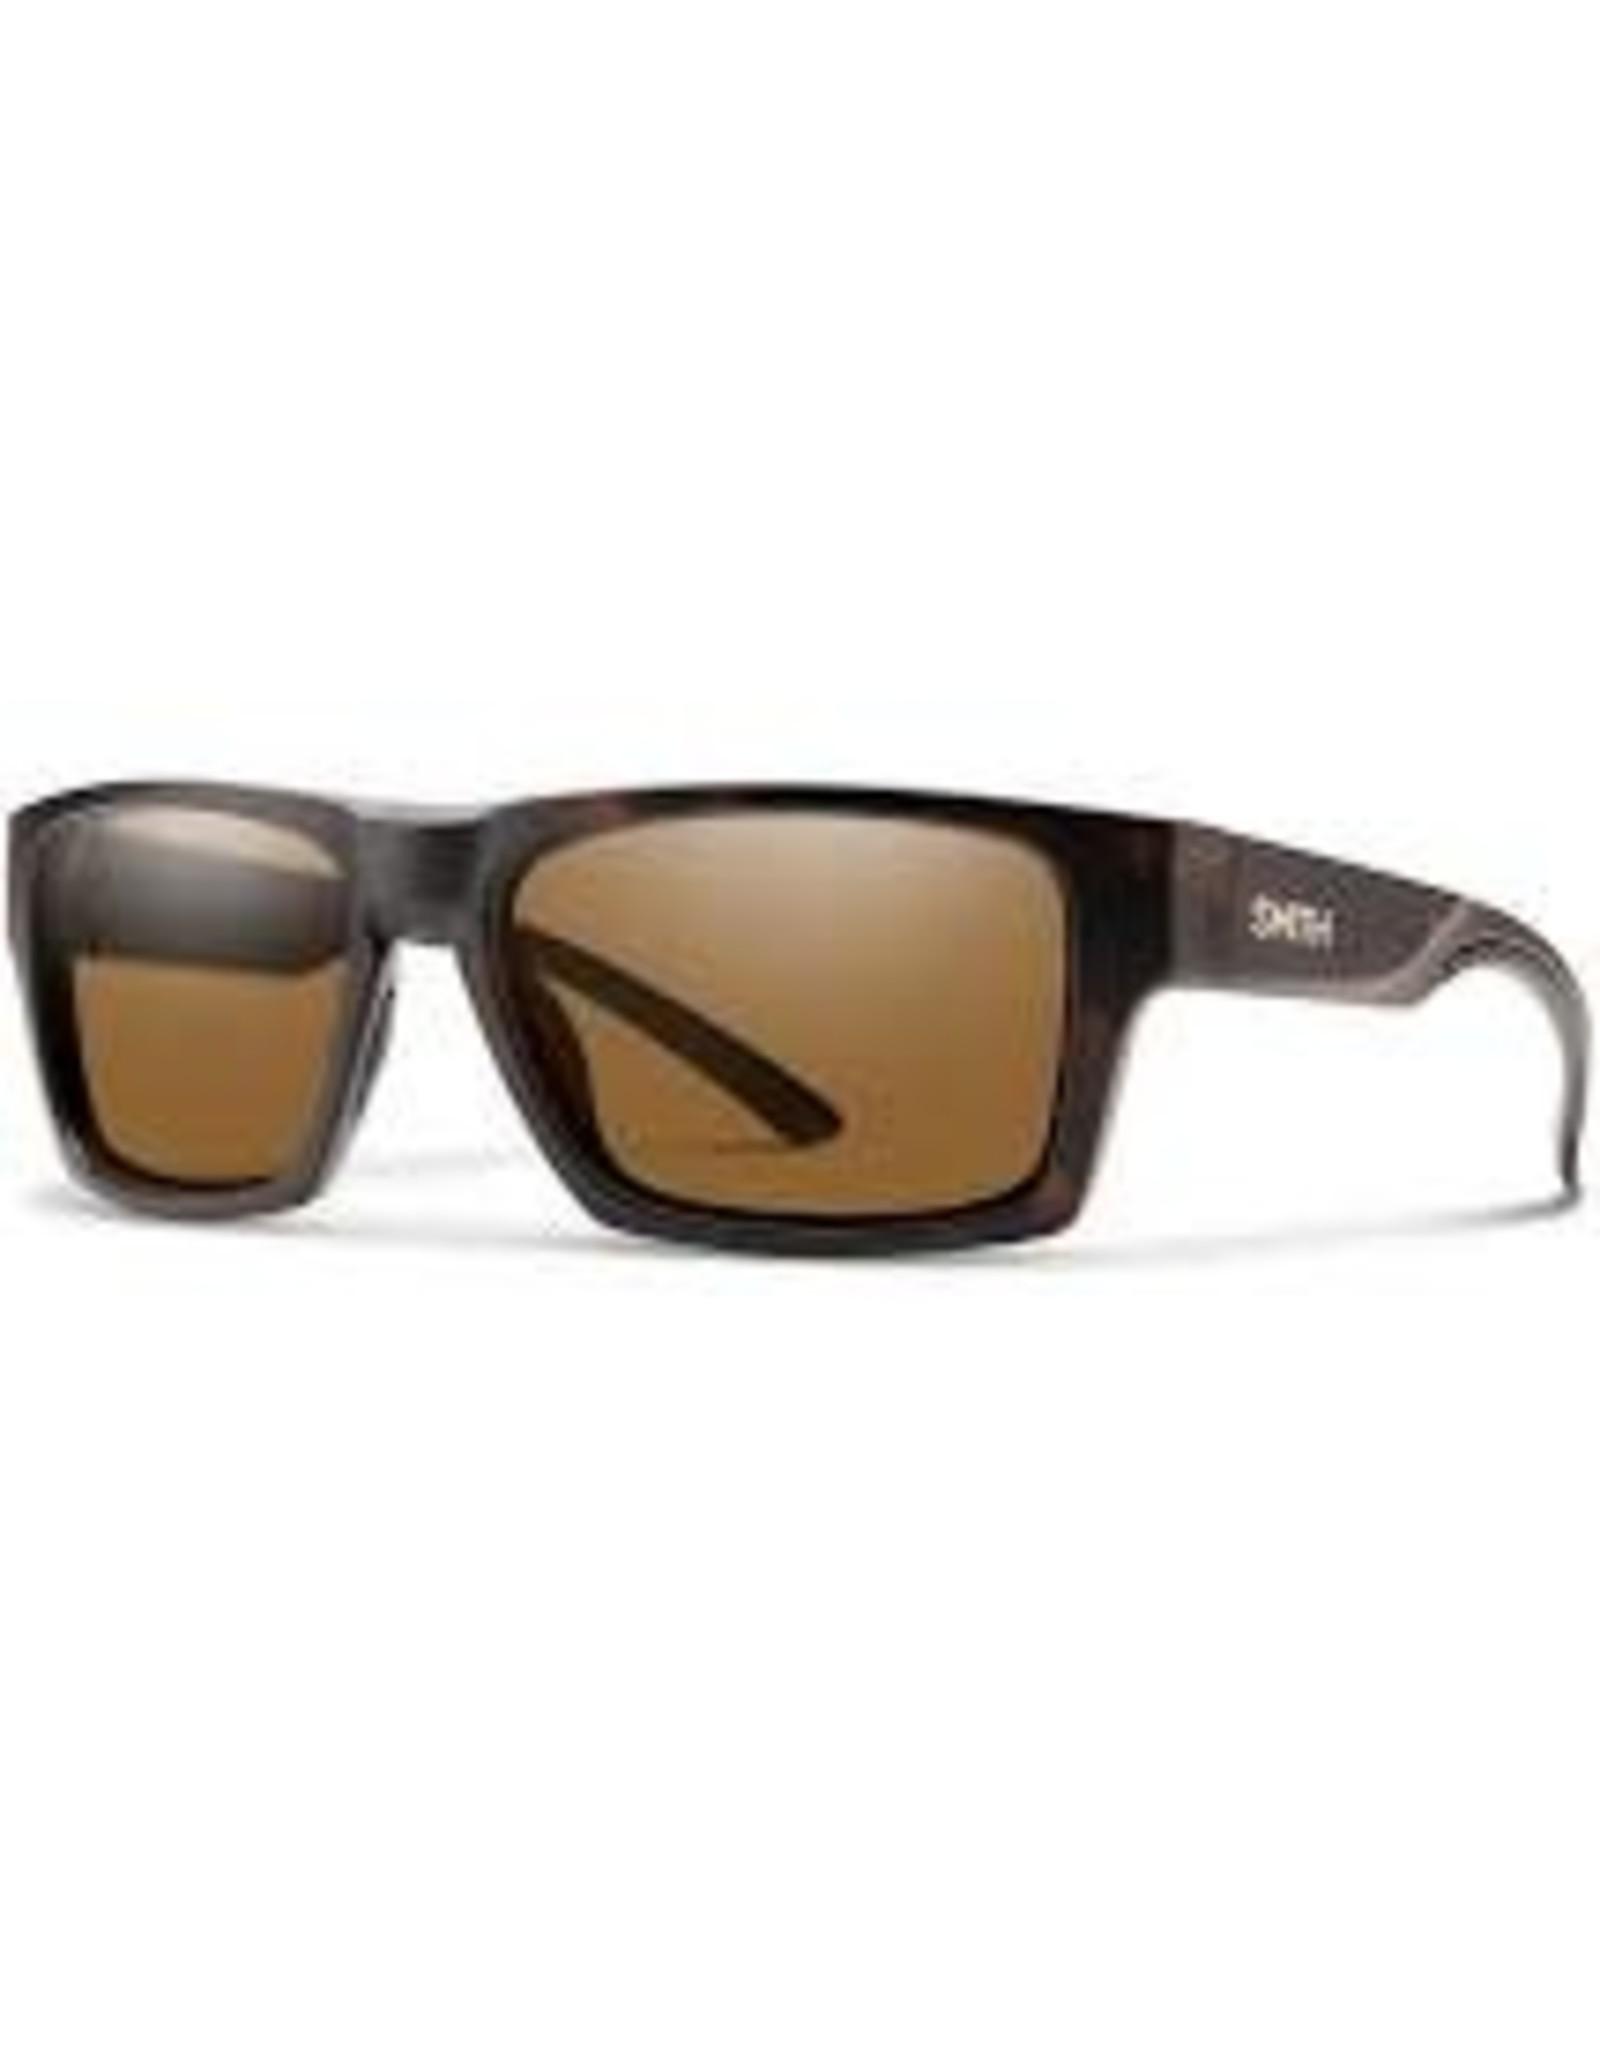 Smith SMITH, Mastermind Sunglasses